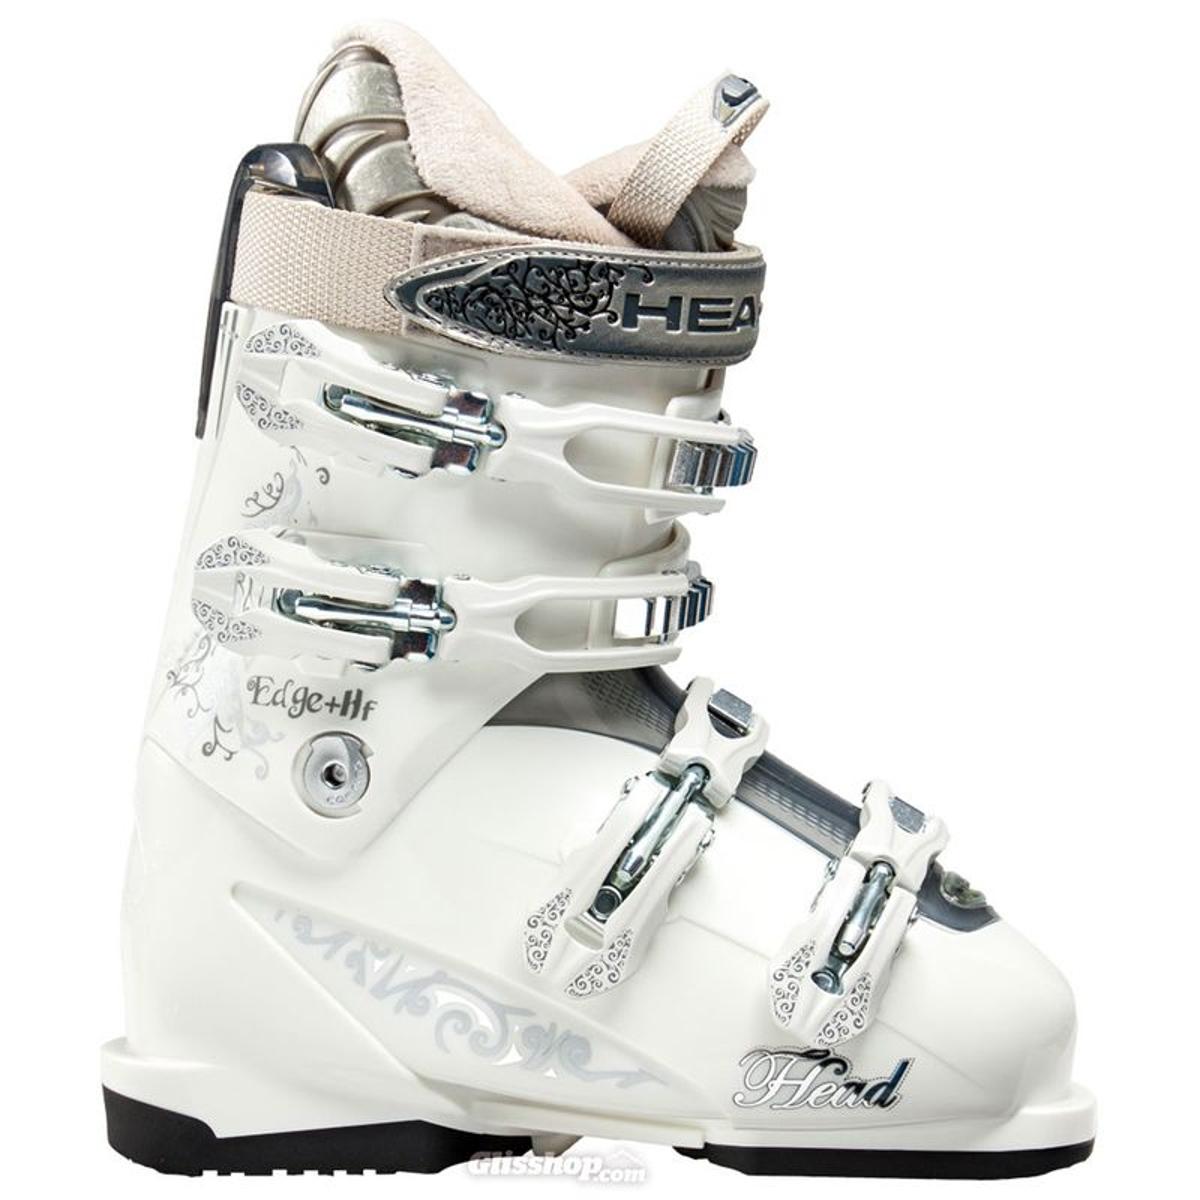 Chaussure de ski Head Edge+ HF One Pearl Tr Anthracite